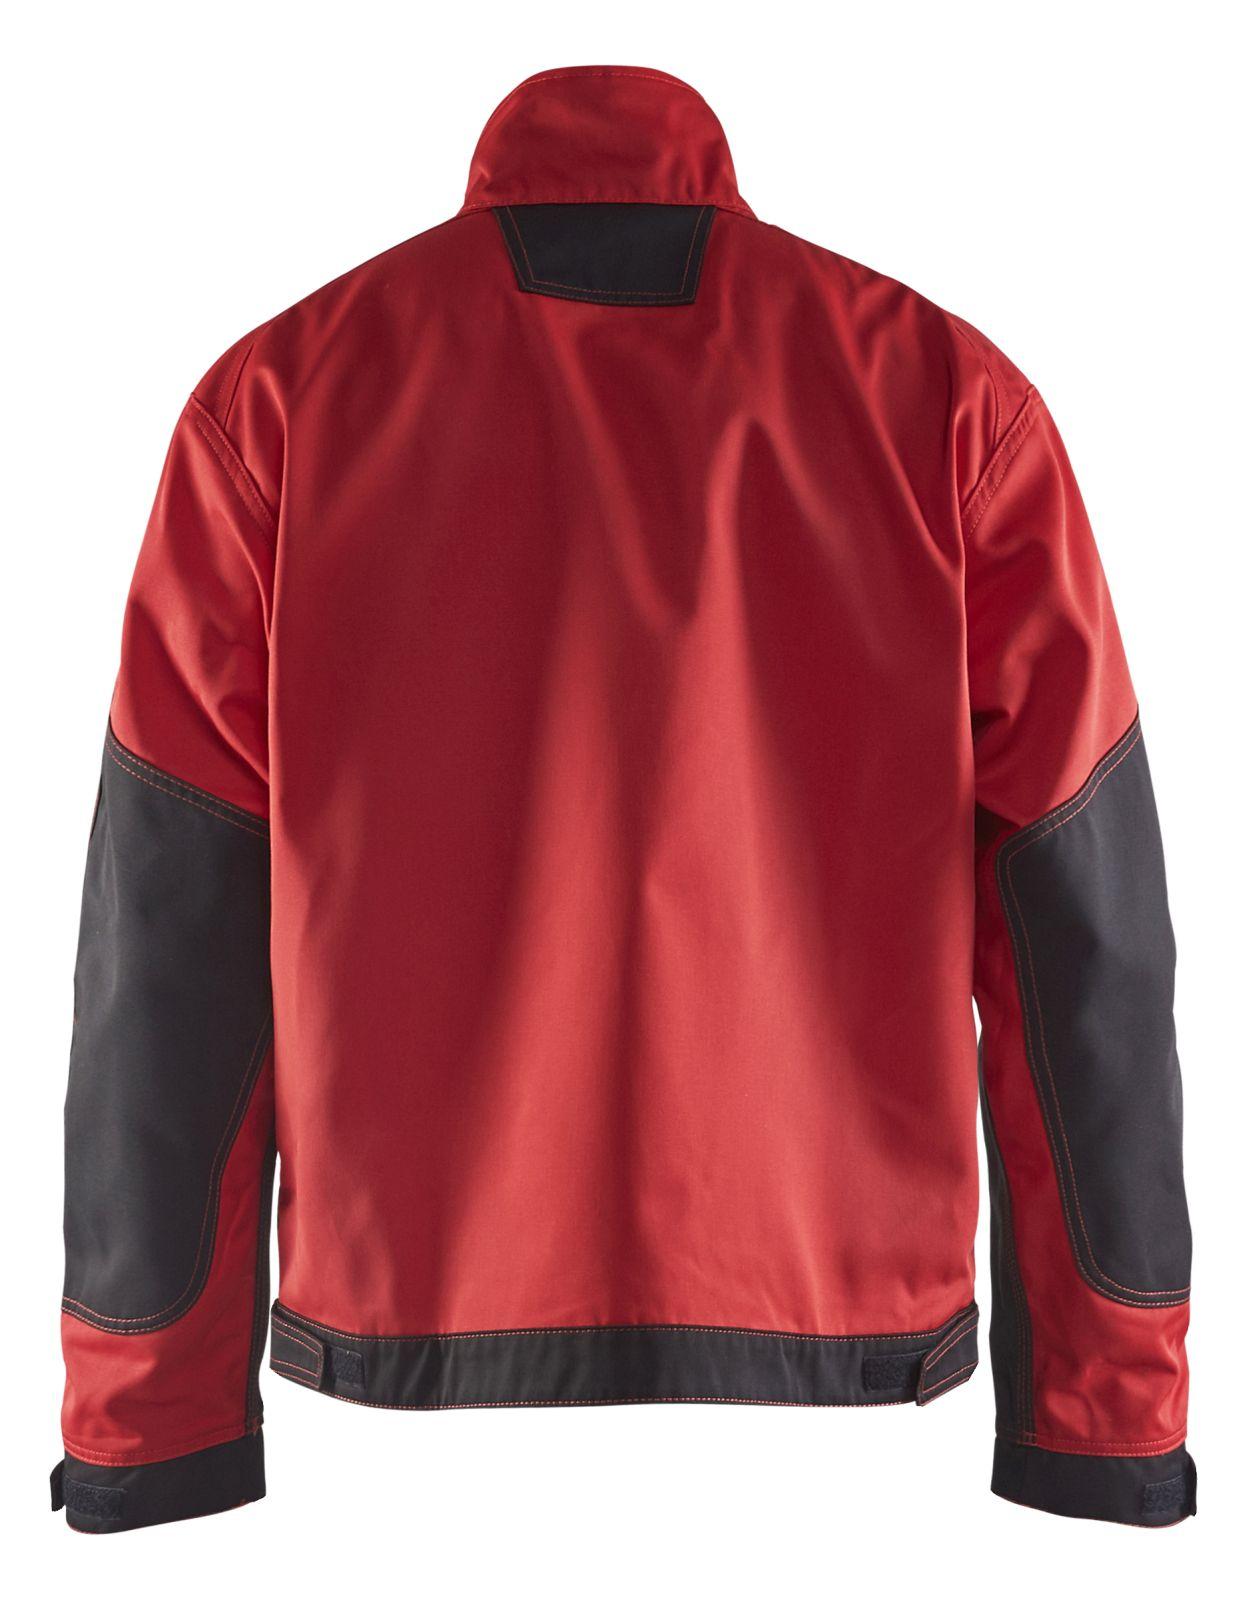 Blaklader Combi-jacks 40631860 rood-zwart(5699)